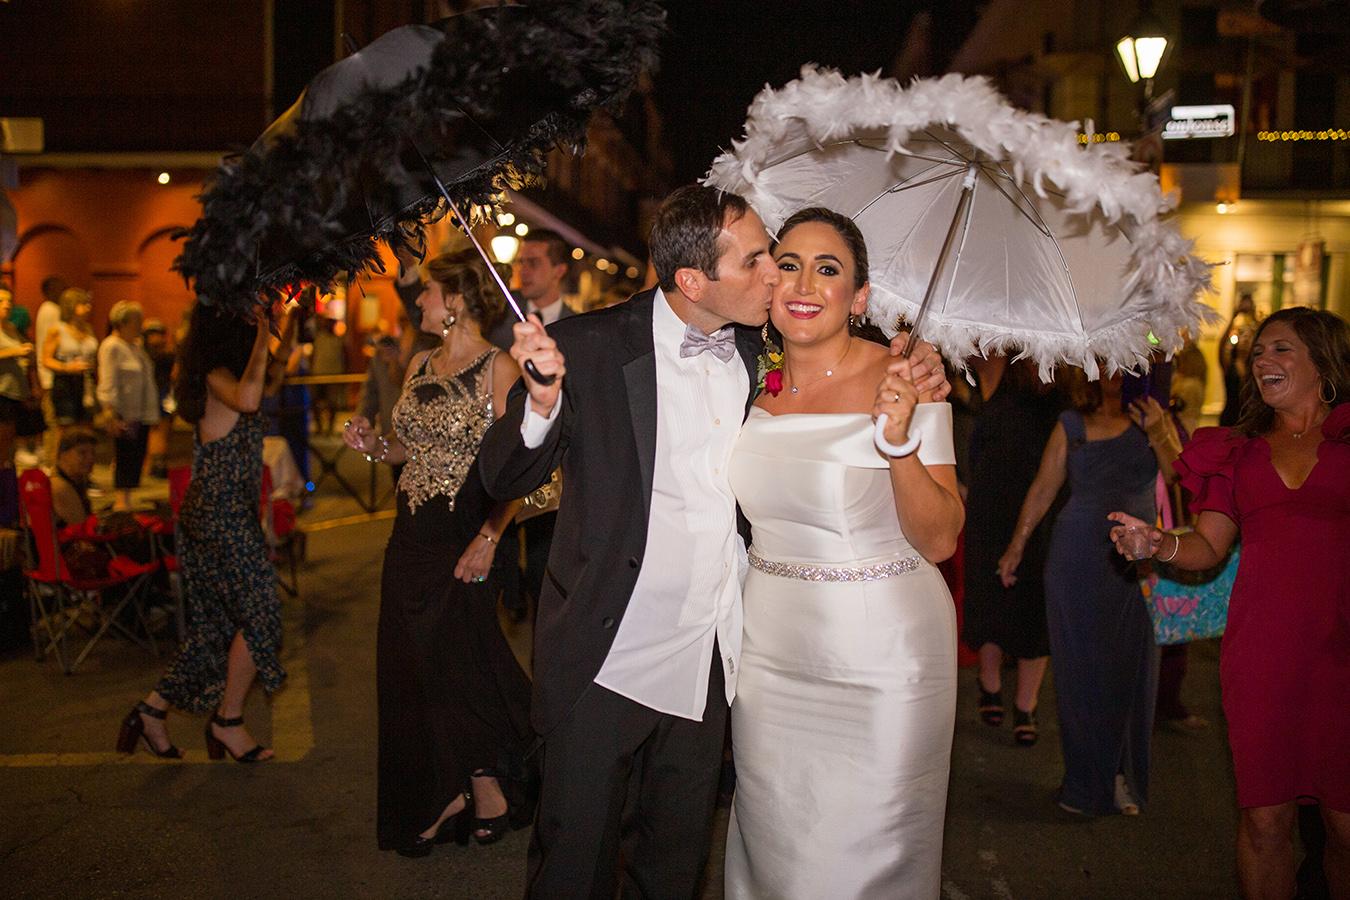 REAL WEDDING:: SUSAN KARIMIHA + RICHARD RUSSO